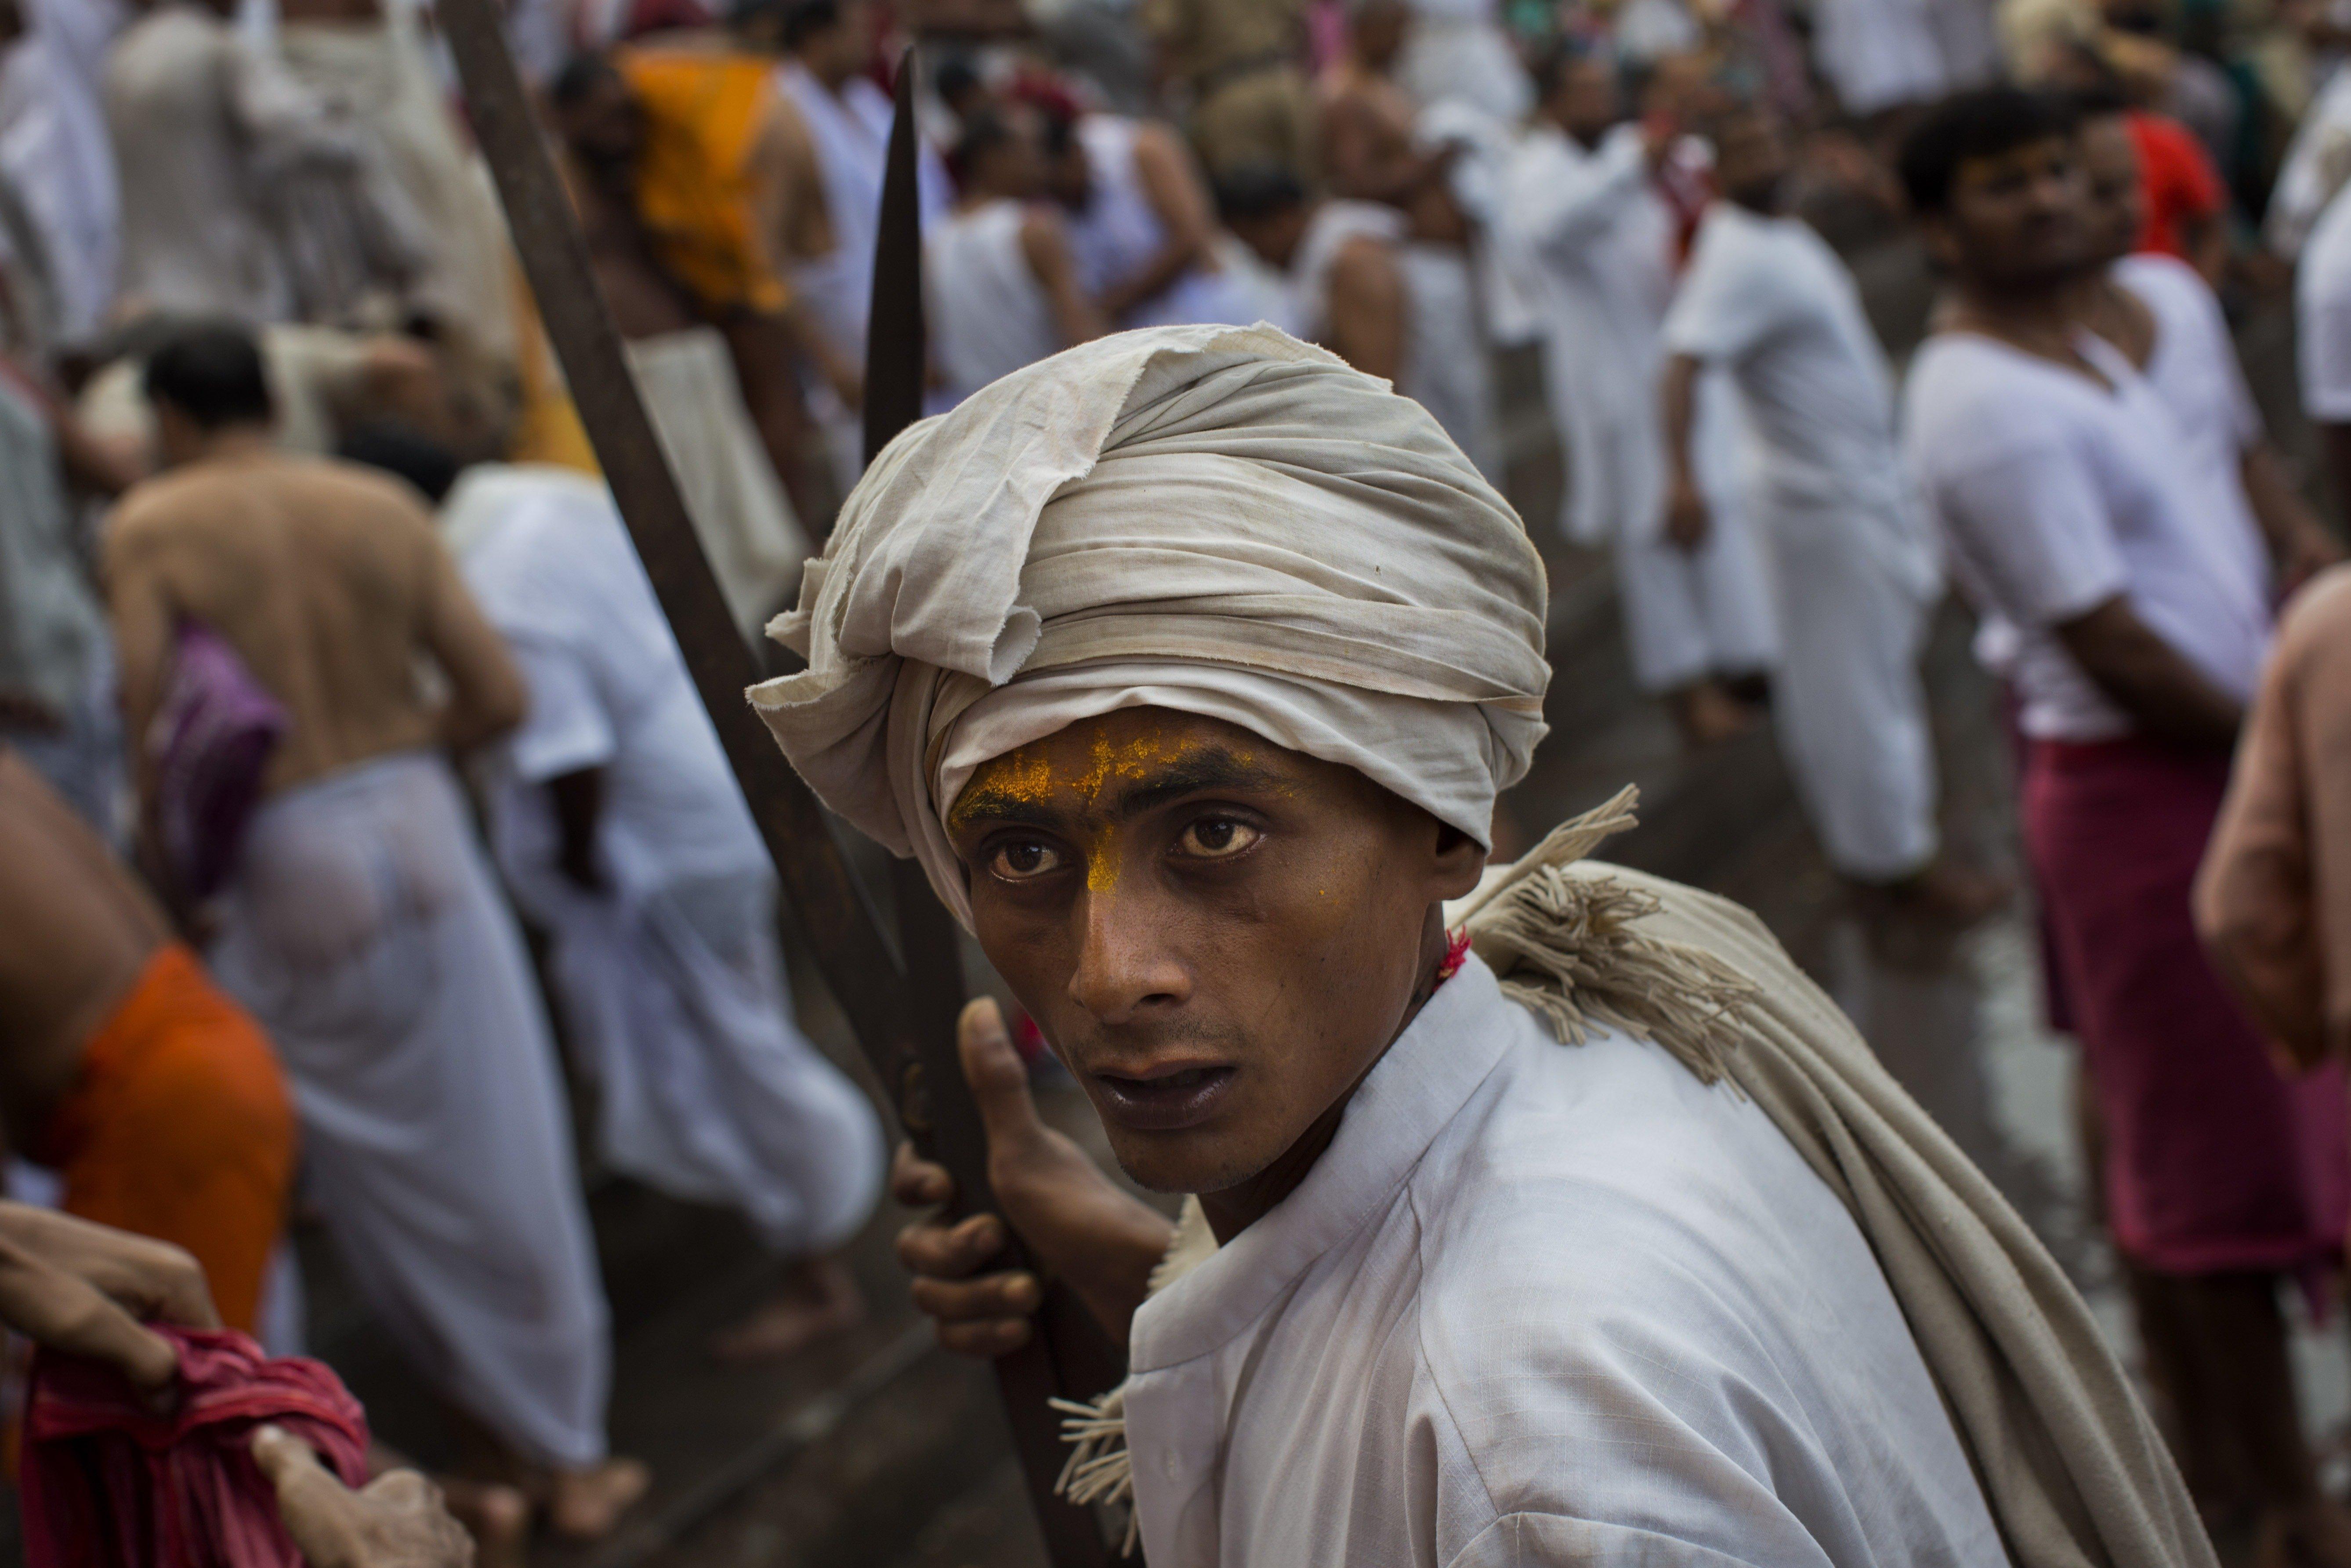 An Hindu devotee prior taking a bath the Godavari River during Kumbh Mela in Nasik, India, on Aug. 29, 2015.